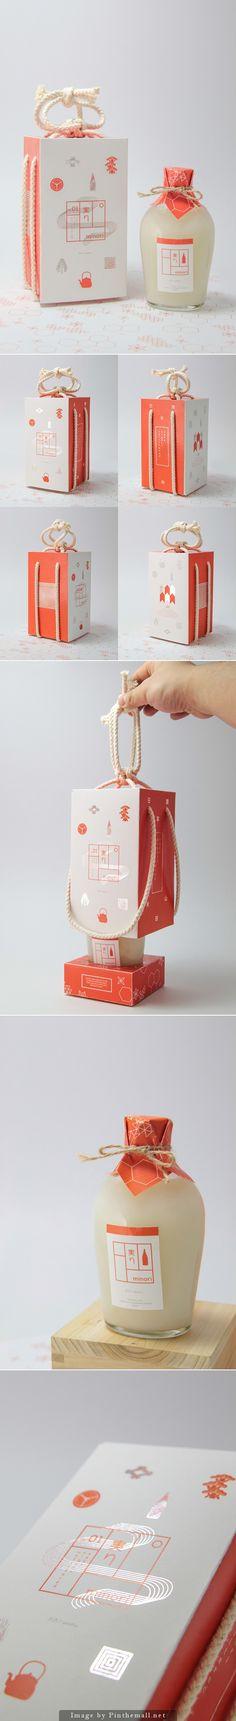 The very beautiful Minori Sake packaging curated by Packaging Diva PD created via https://www.behance.net/gallery/17444375/Minori-Sake